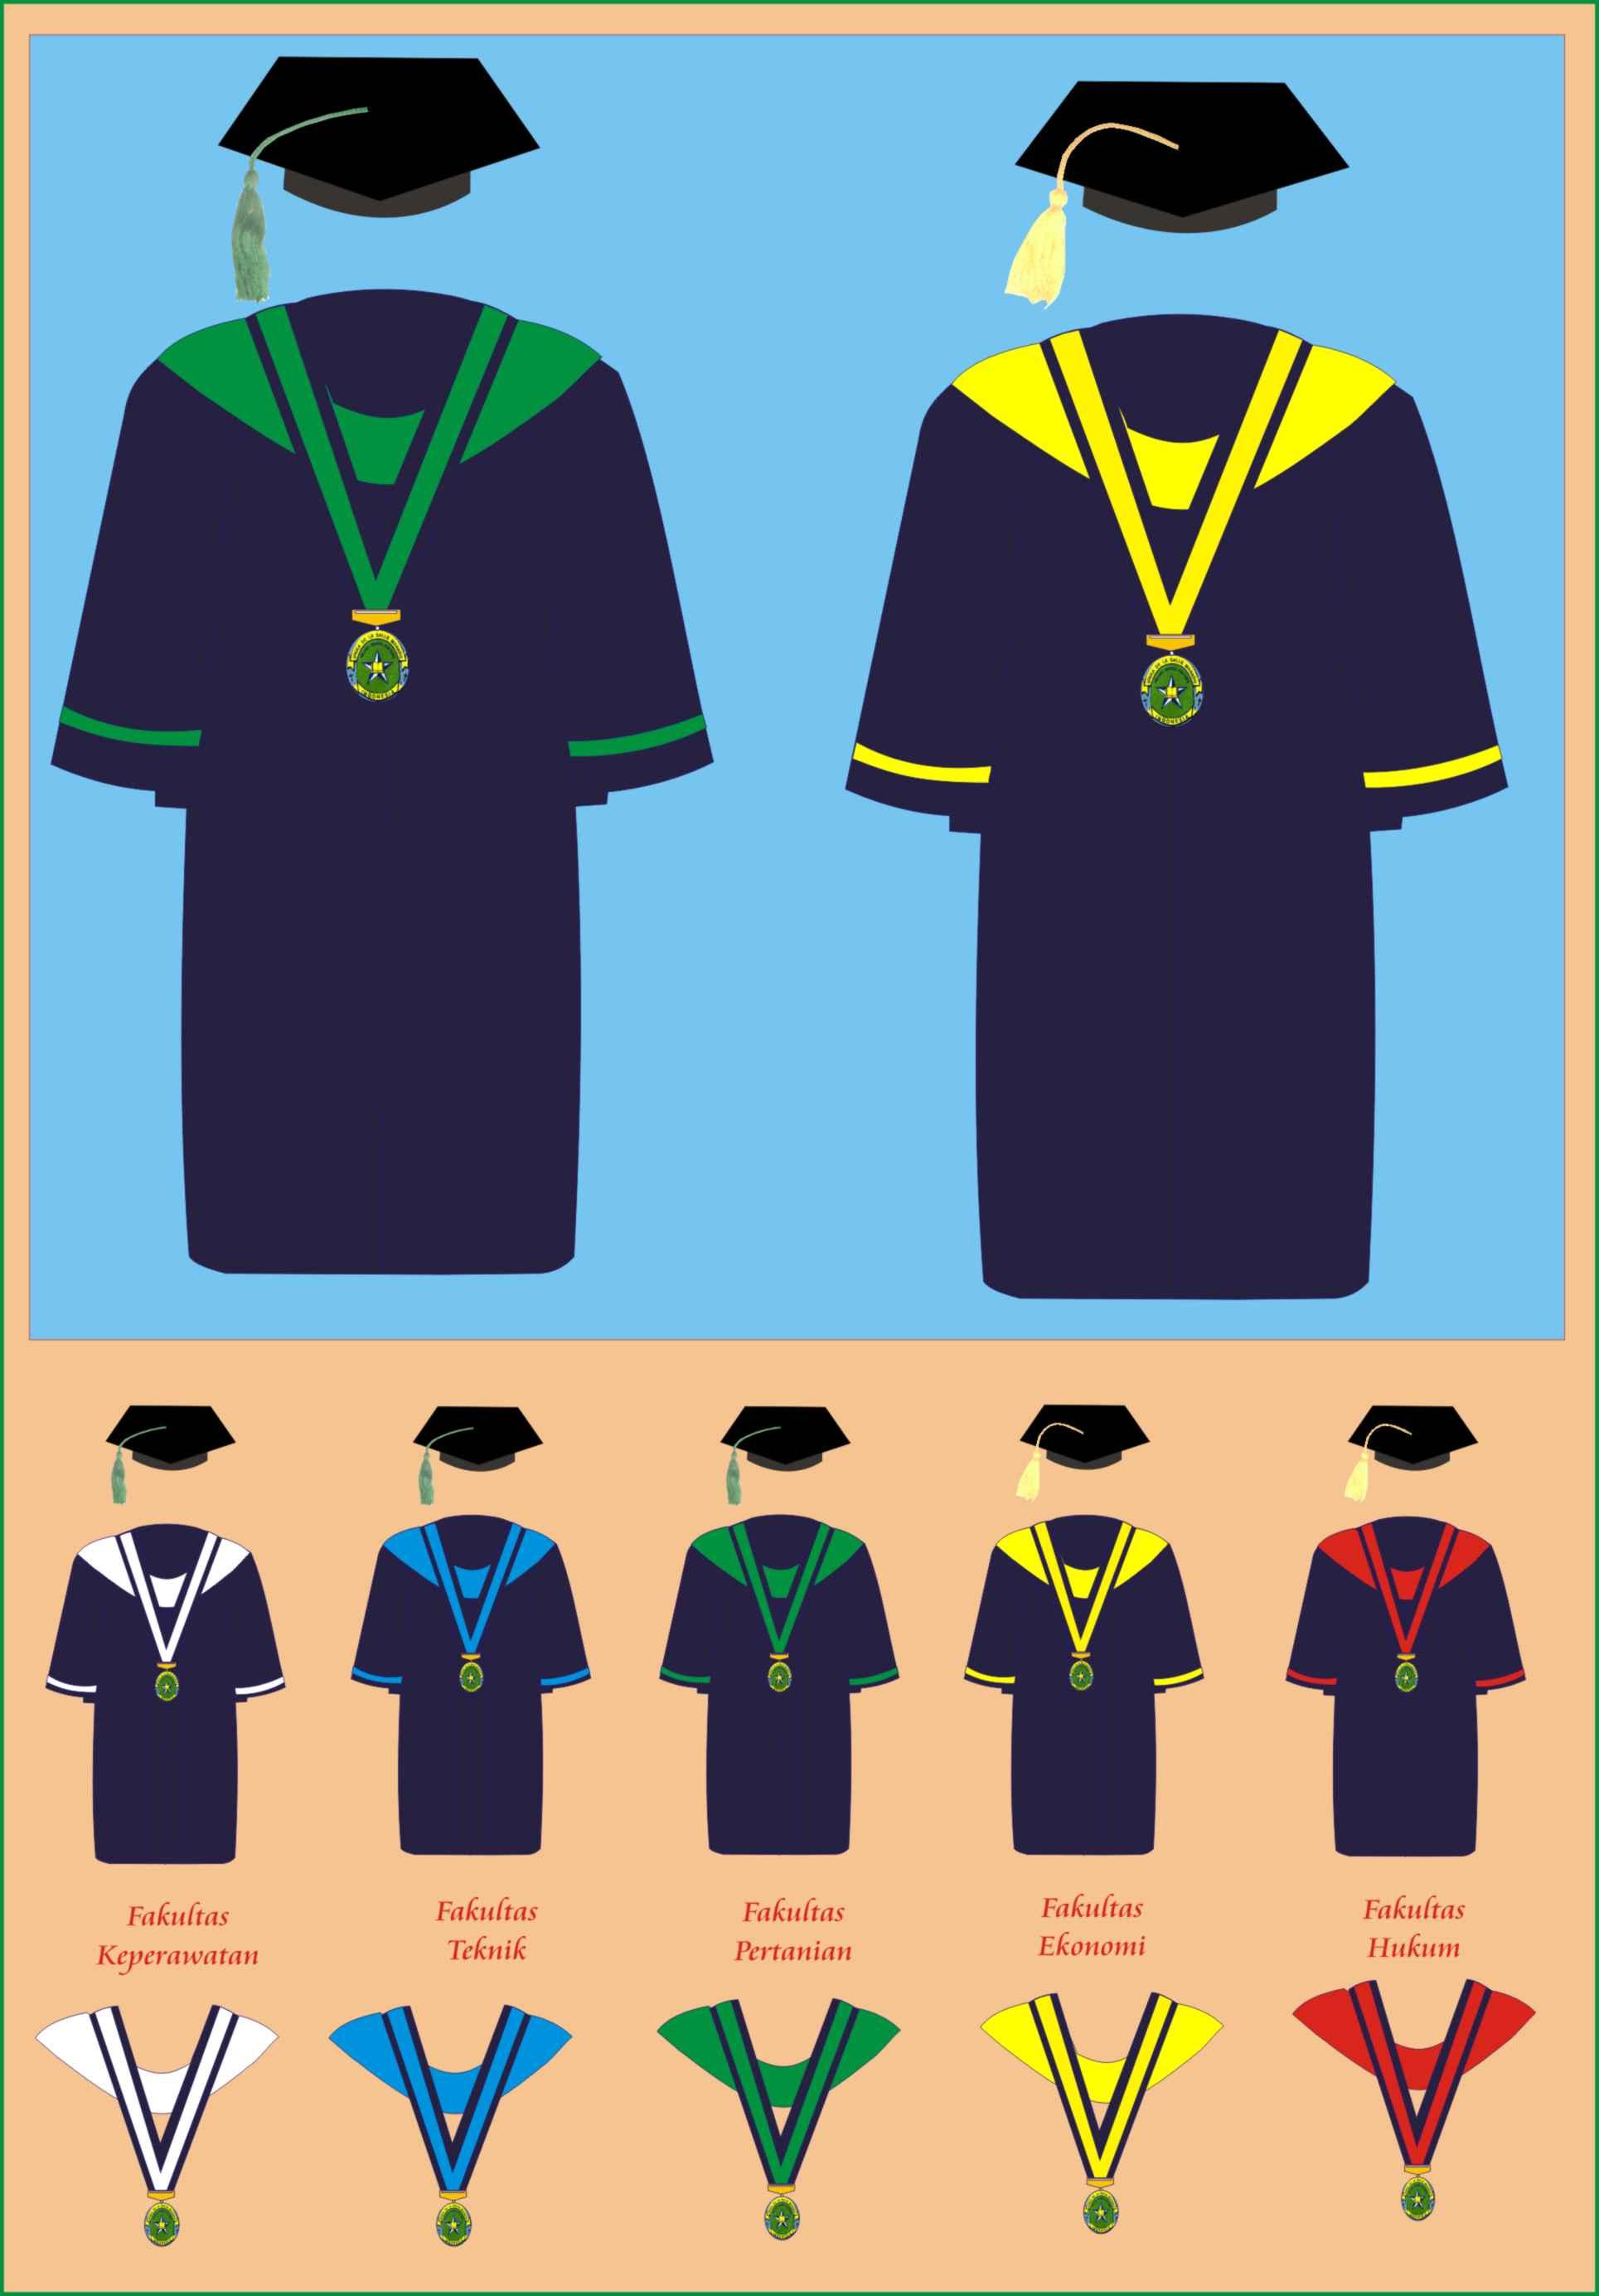 Persewaan Toga Wisuda Termurah diSurabaya | 082-334-194-935, persewaan toga wisuda termurah, kebaya wisuda, kebaya wisuda modern, kebaya wisuda modern hijab, kebaya wisuda hijab, kebaya wisuda surabaya, kebaya wisuda 2020, kebaya wisuda terbaru, kebaya wisuda modern hijab 2020, kebaya wisuda simpel dan elegan, Persewaan Toga Wisuda Termurah diSurabaya | 082-334-194-935